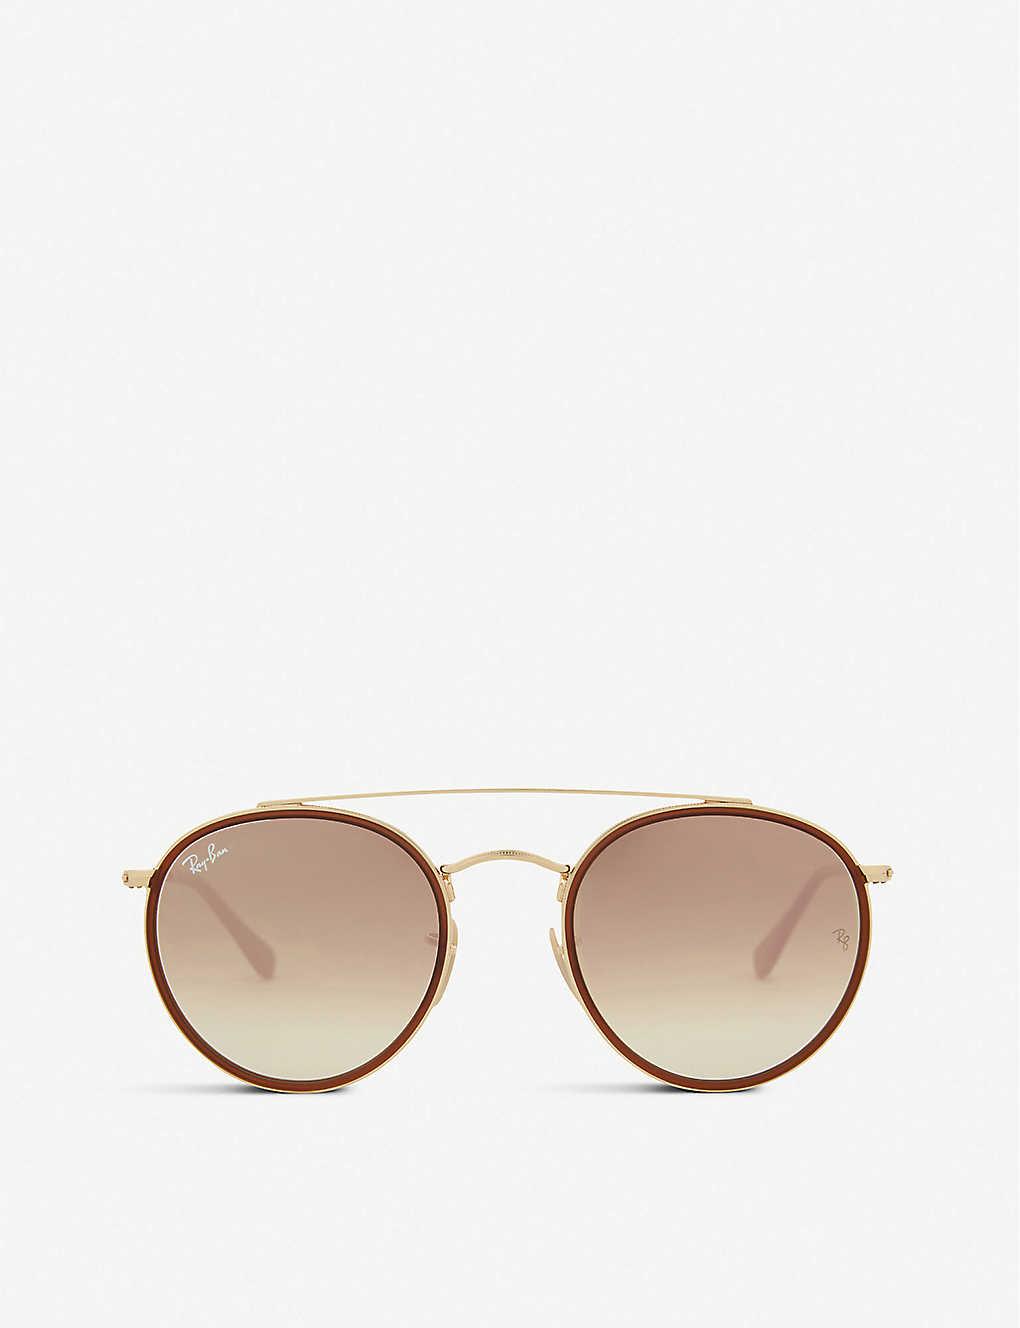 4b77247b93 RAY-BAN - Rb3647 round-frame sunglasses